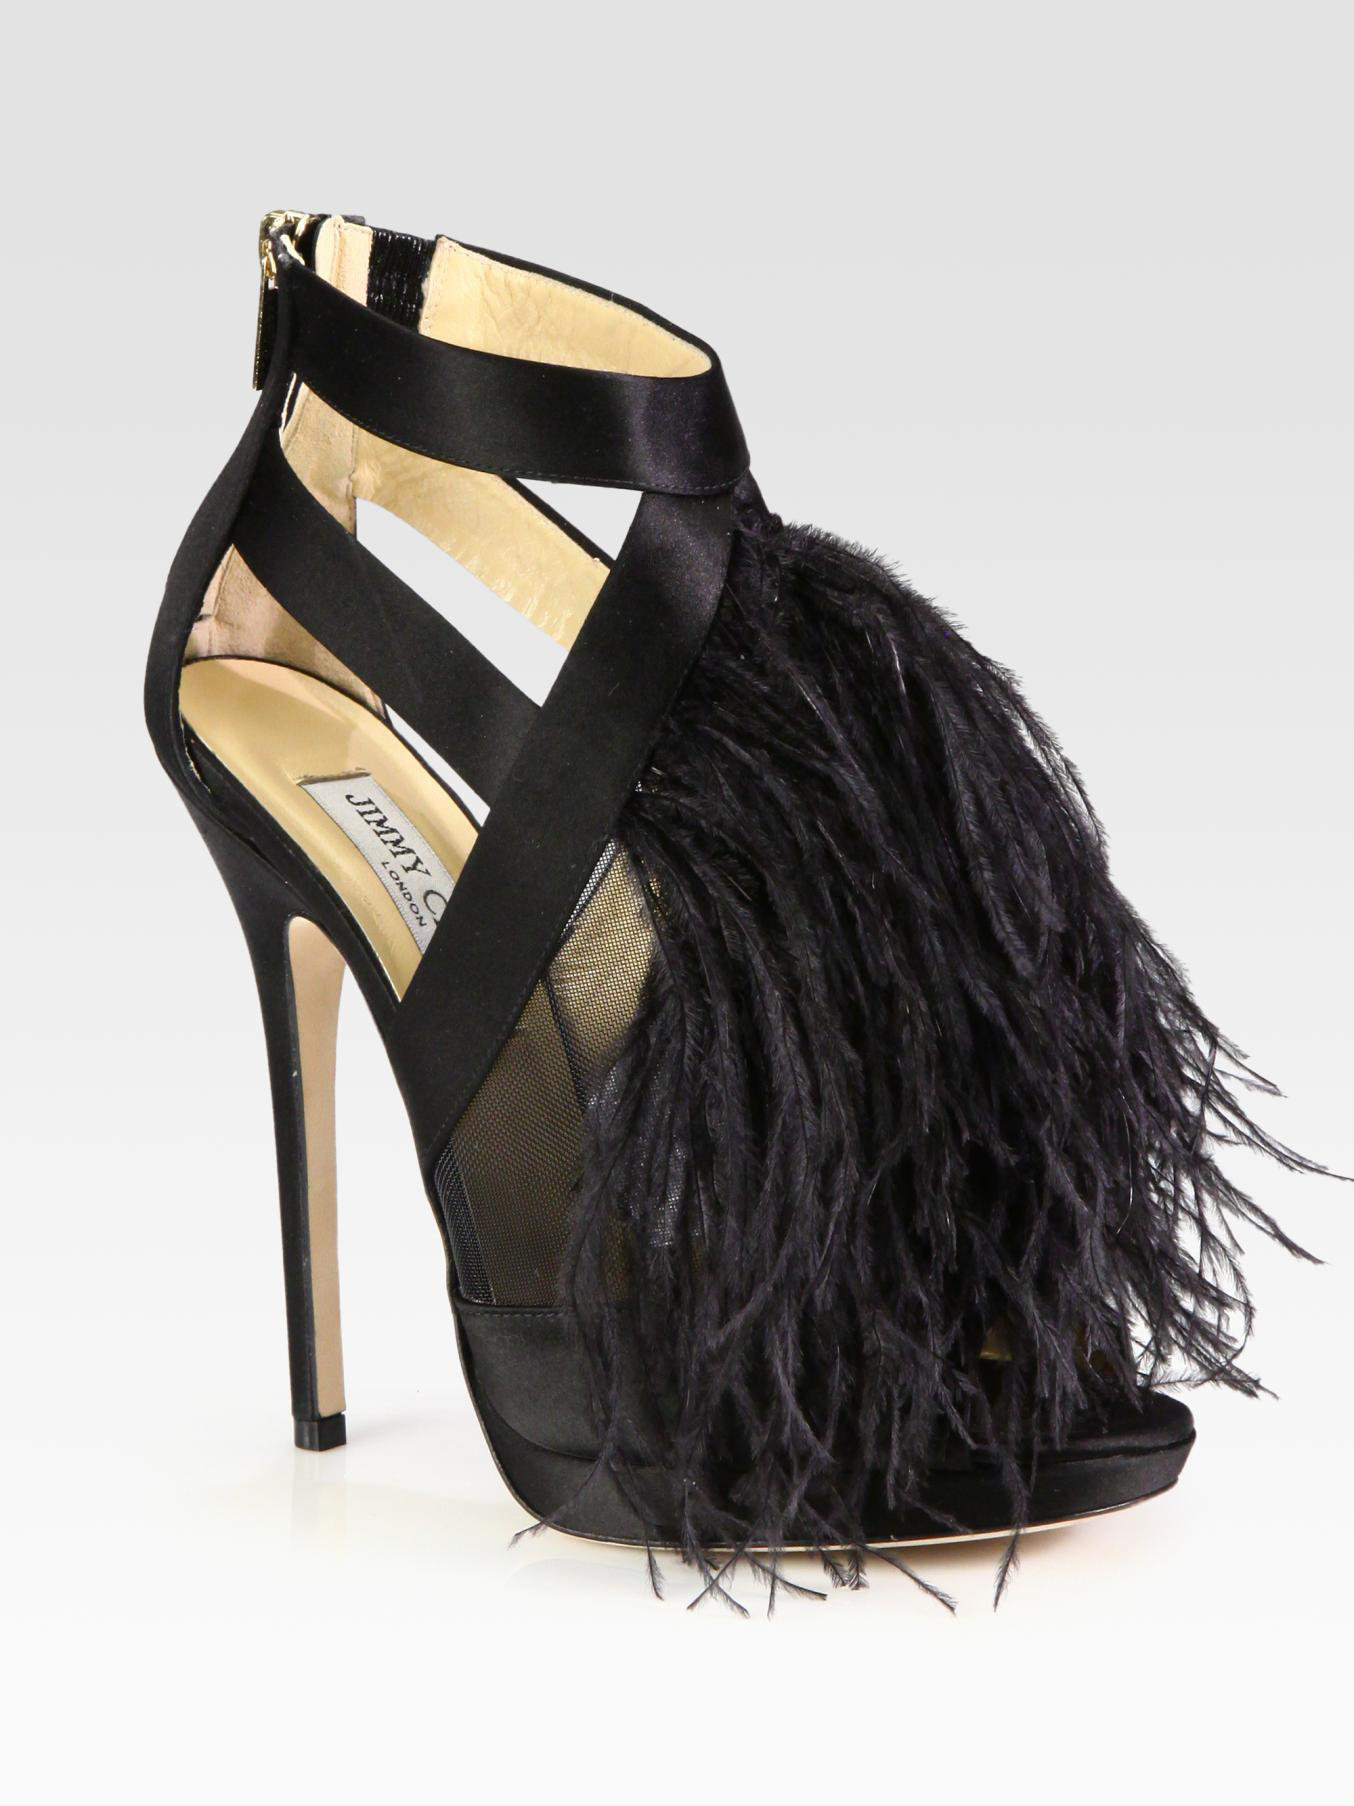 Saks fifth avenue bridal shoes